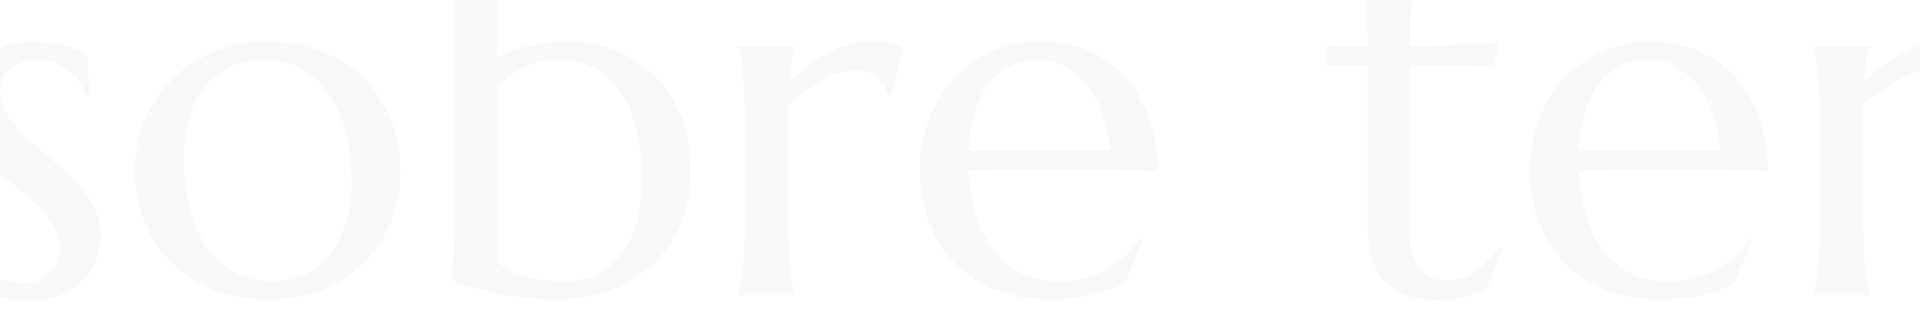 fondo_bajo_menu_superior_TER